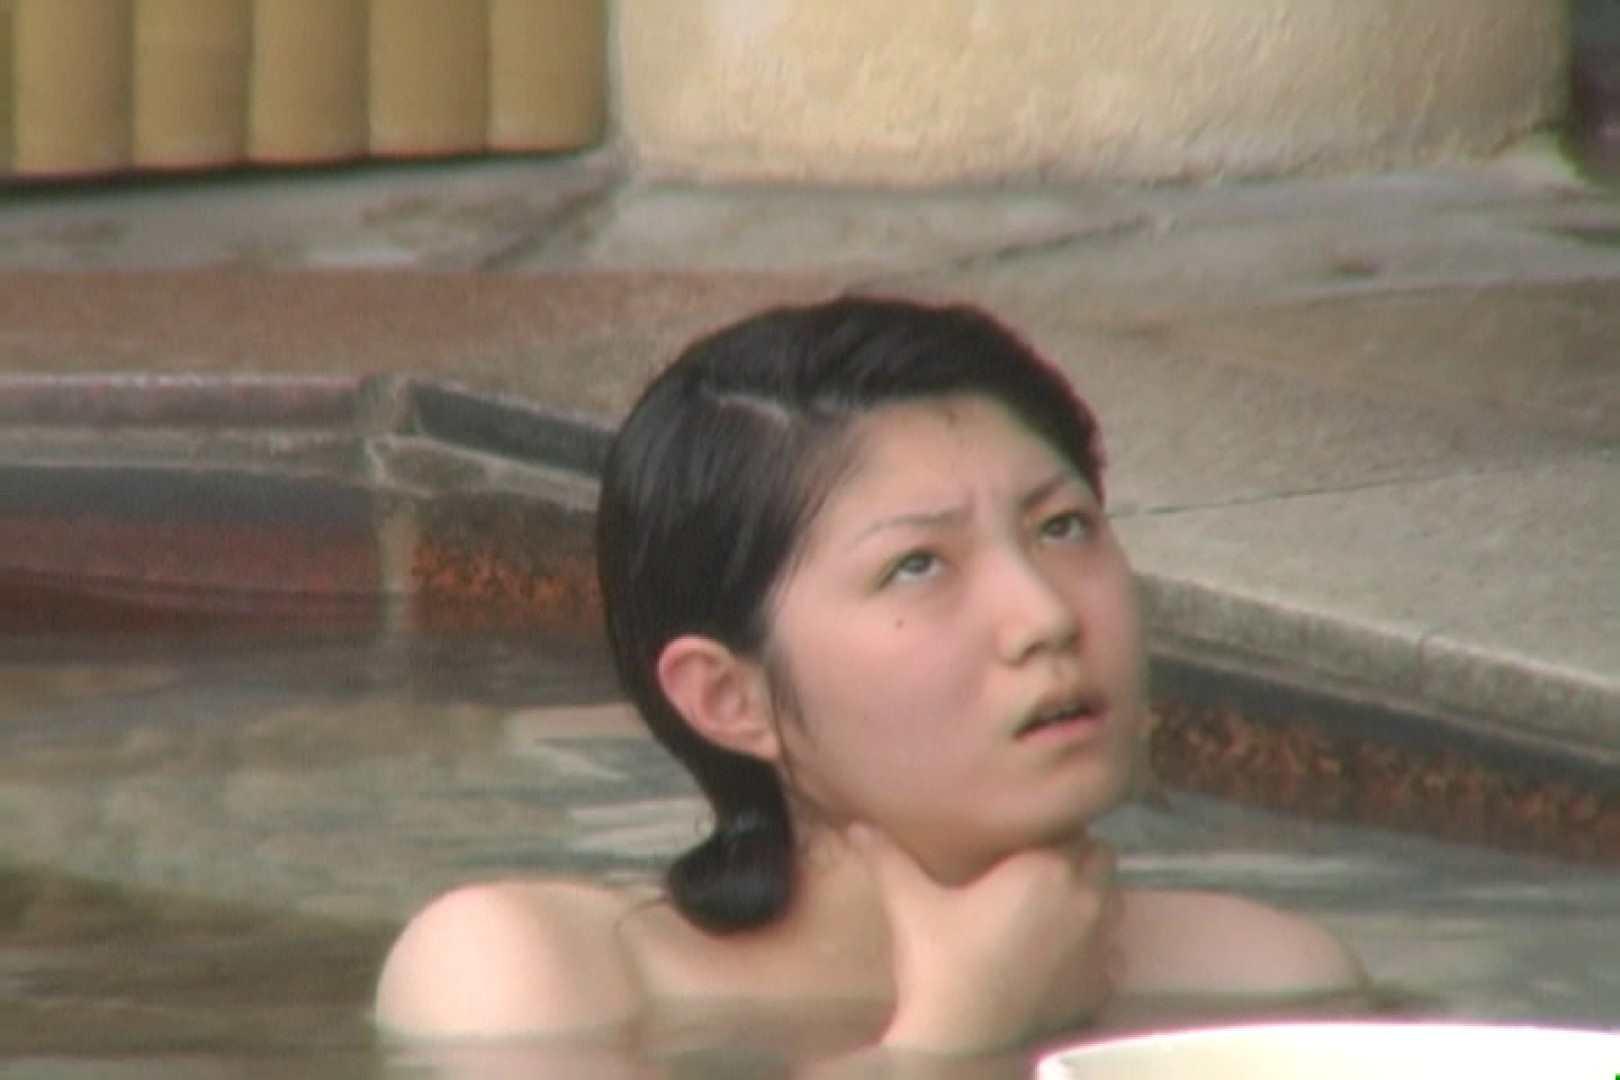 Aquaな露天風呂Vol.579 盗撮 隠し撮りオマンコ動画紹介 42PICs 35